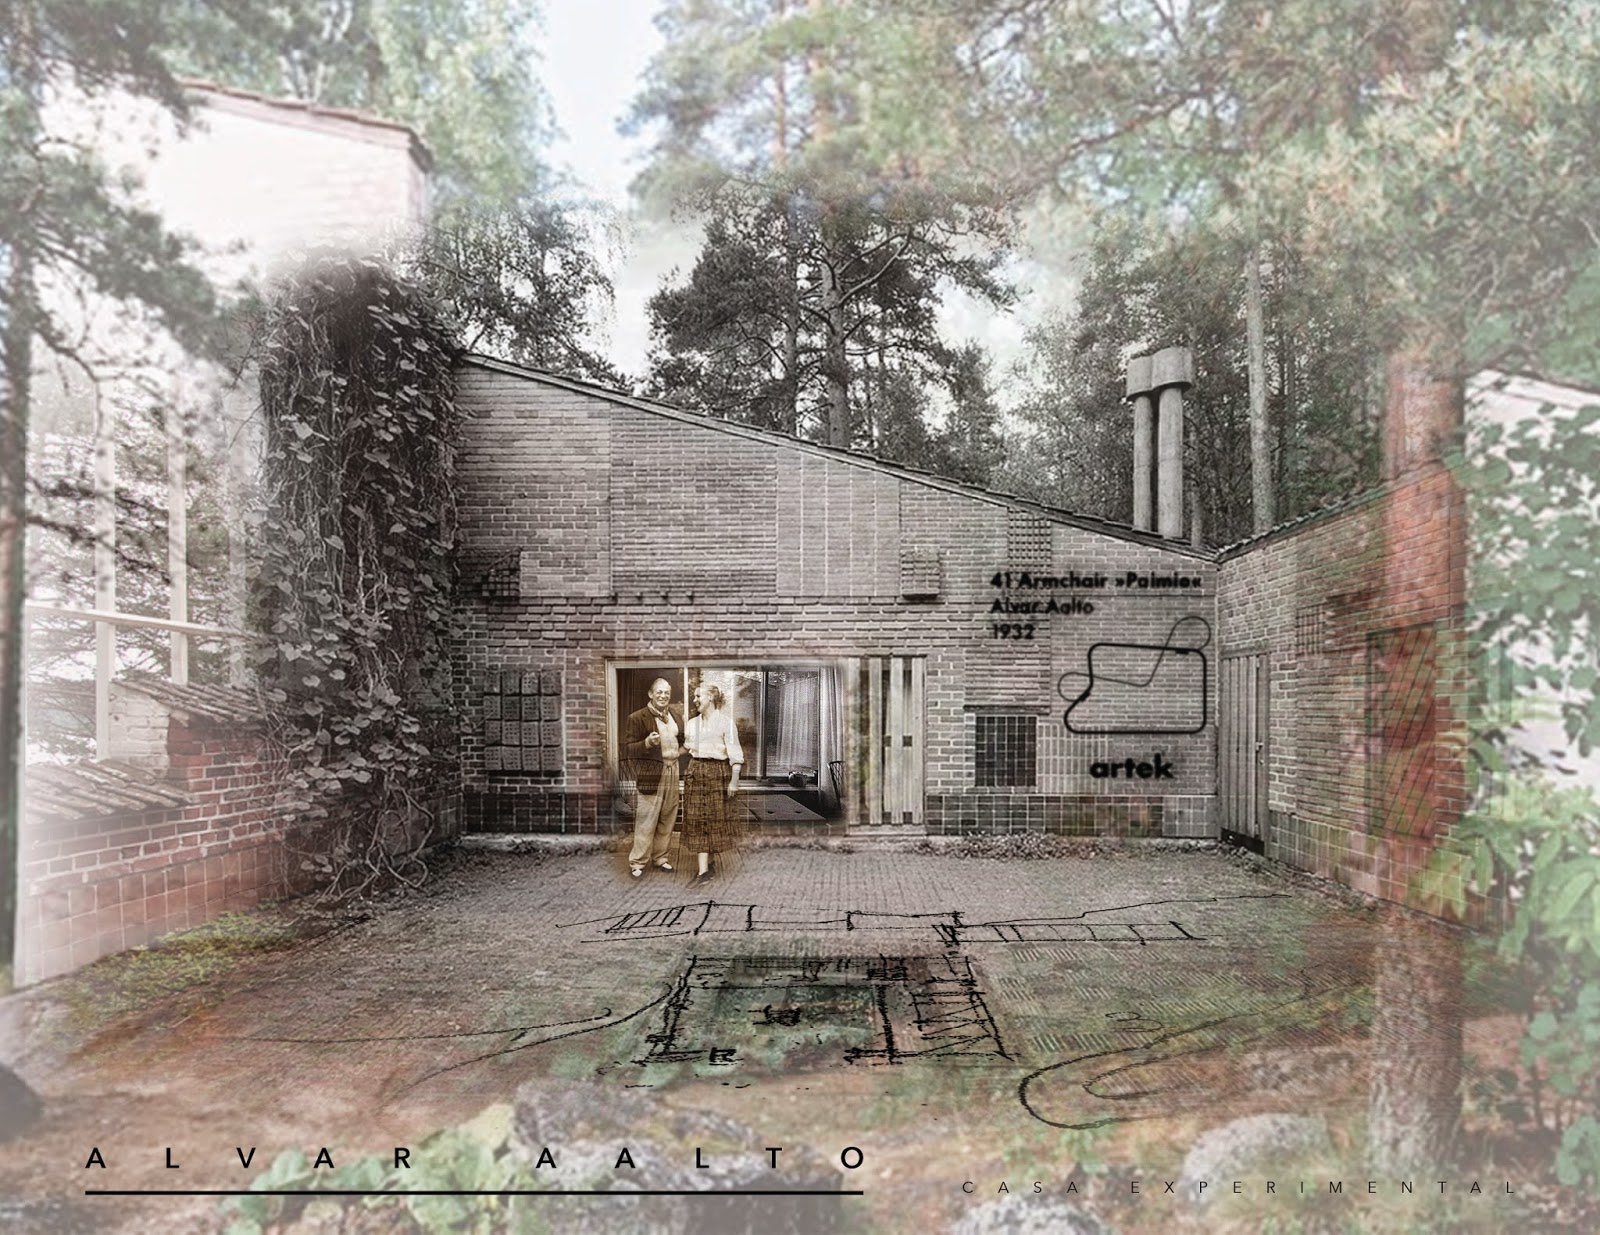 Historia De La Arquitectura Moderna Casa Aalto Muuratsalo